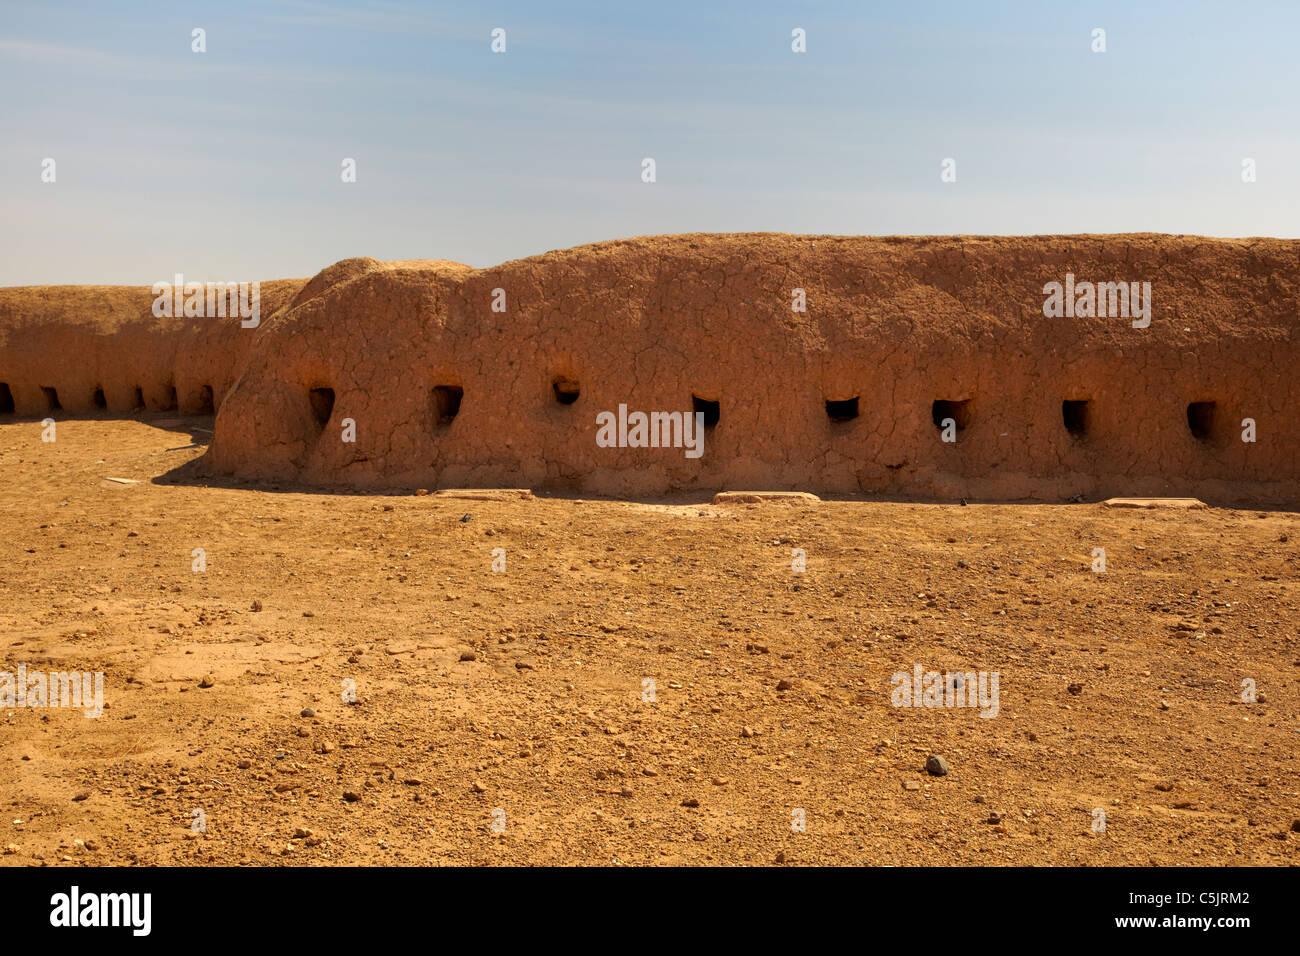 Abdul Kayoum Gate Fort, Omdurman, Northern Sudan, Africa - Stock Image